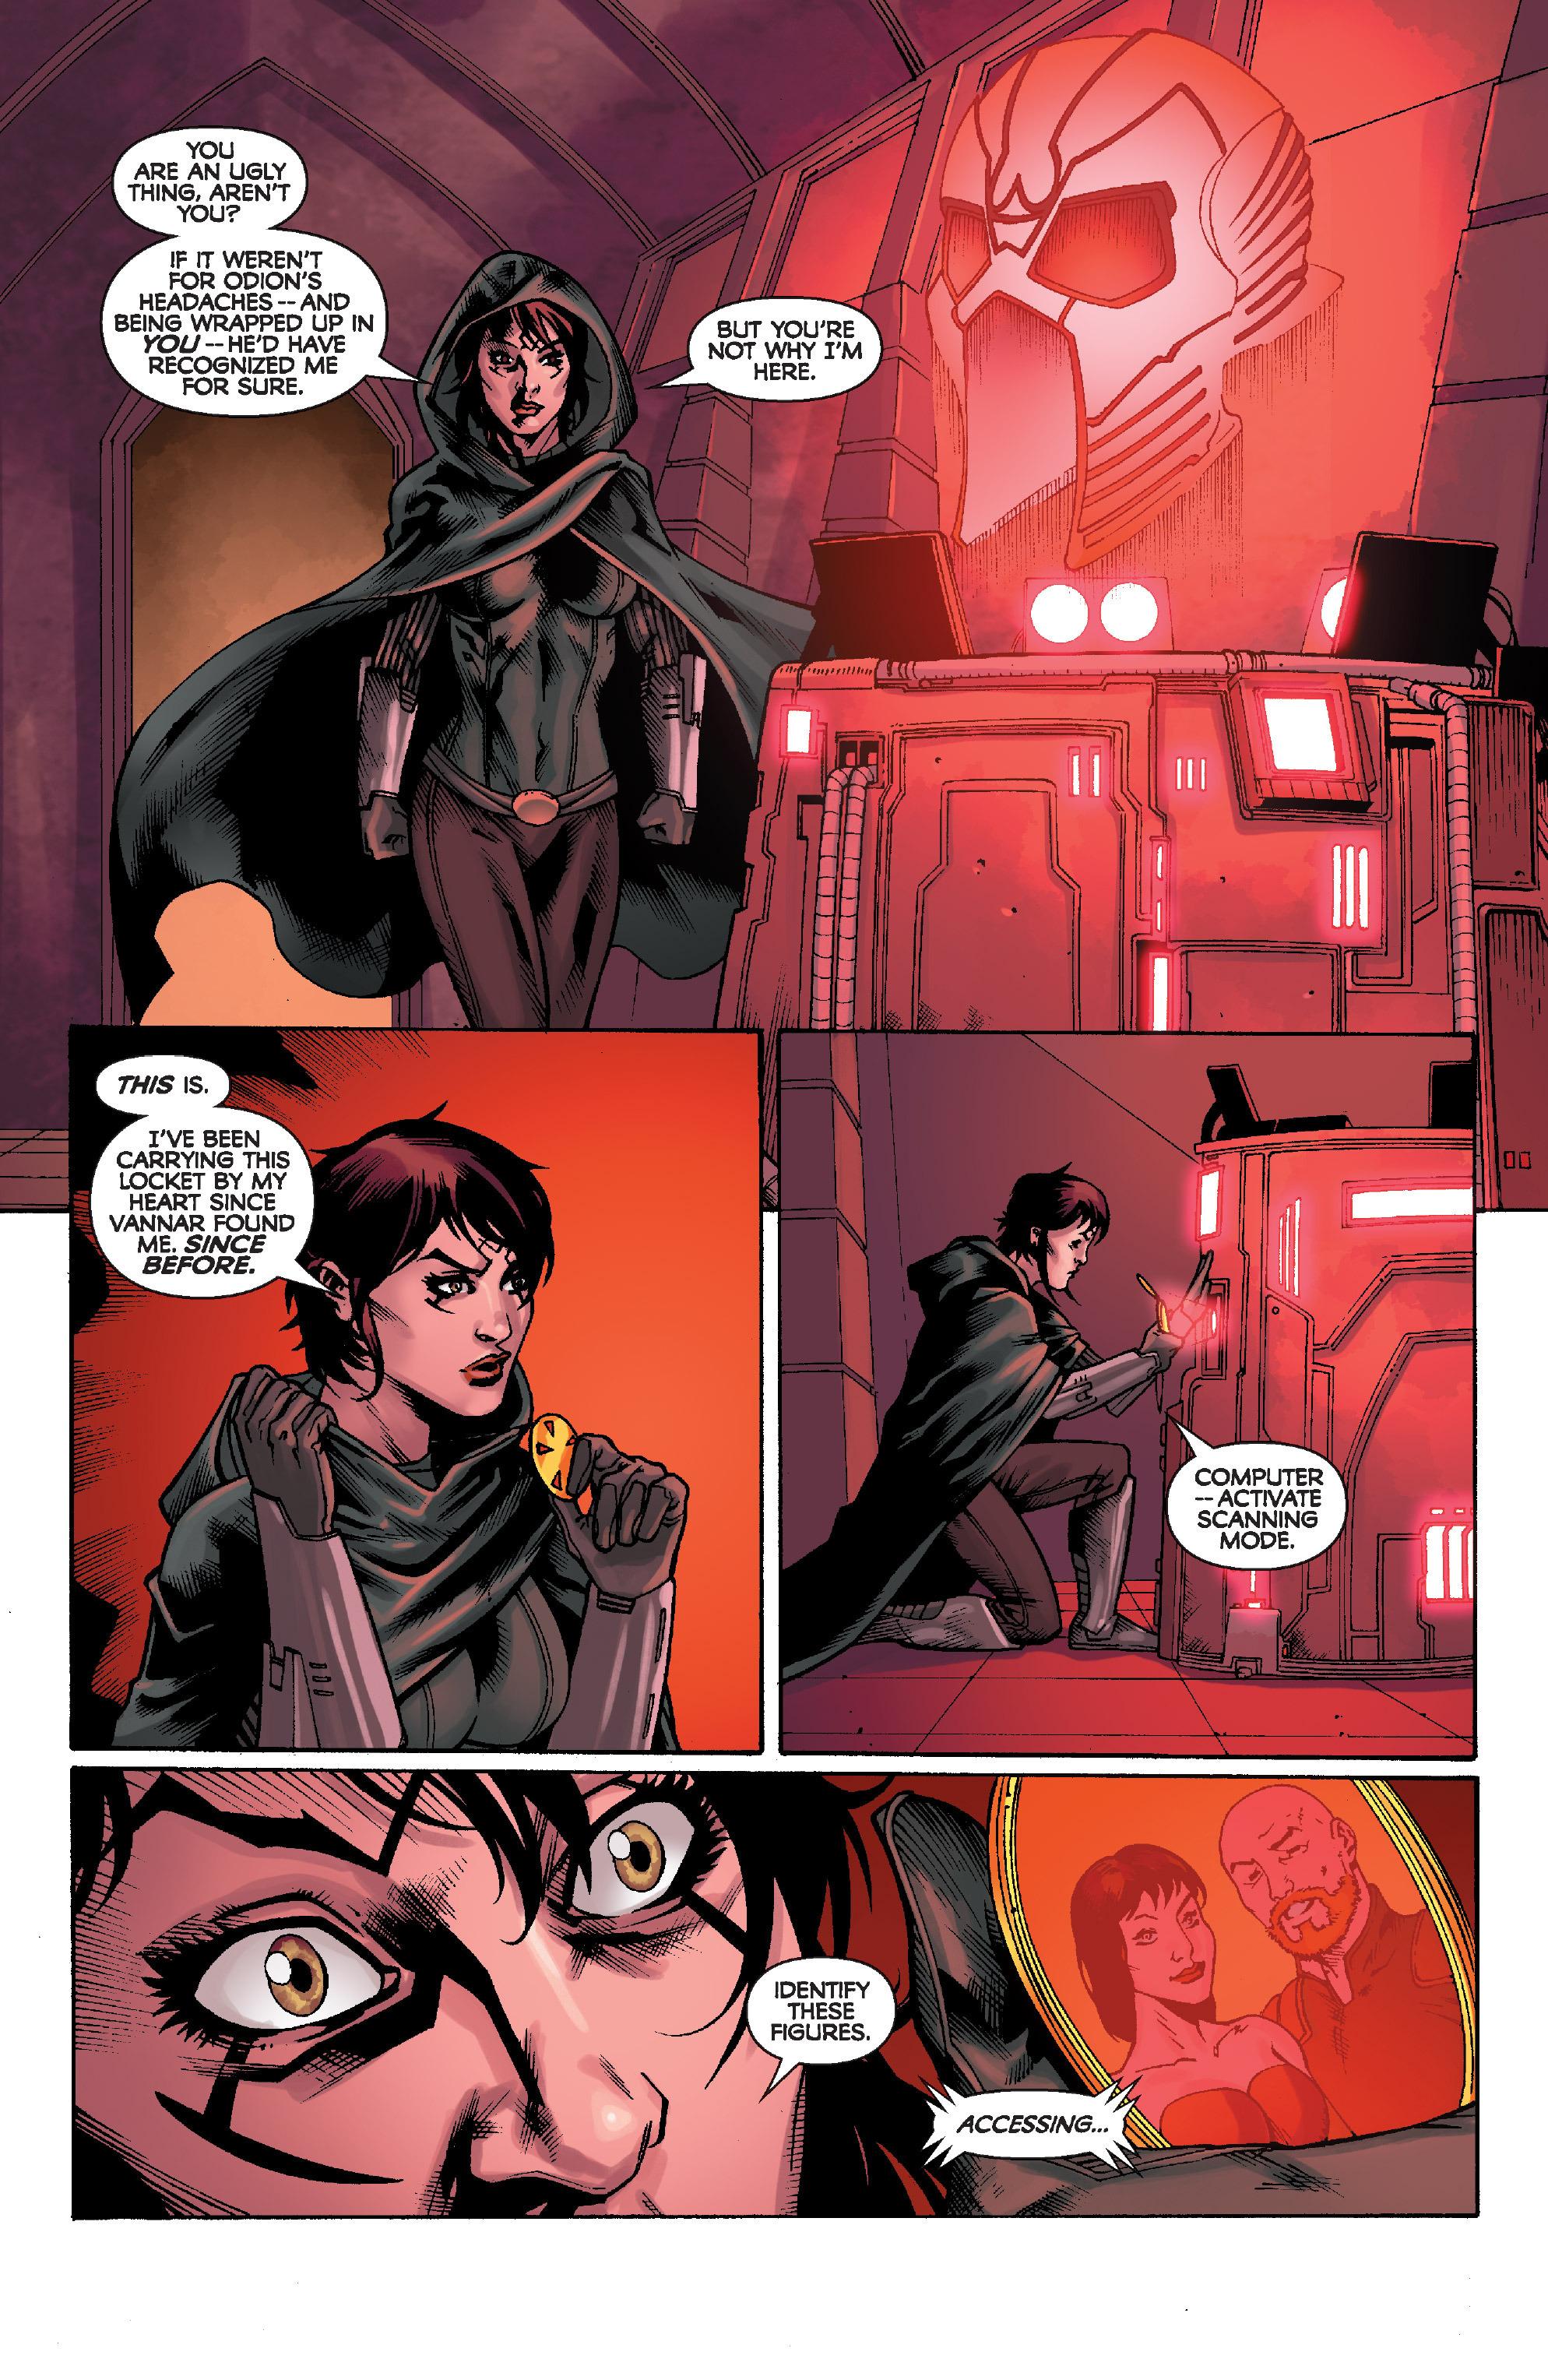 Read online Star Wars: Knight Errant - Escape comic -  Issue #1 - 23